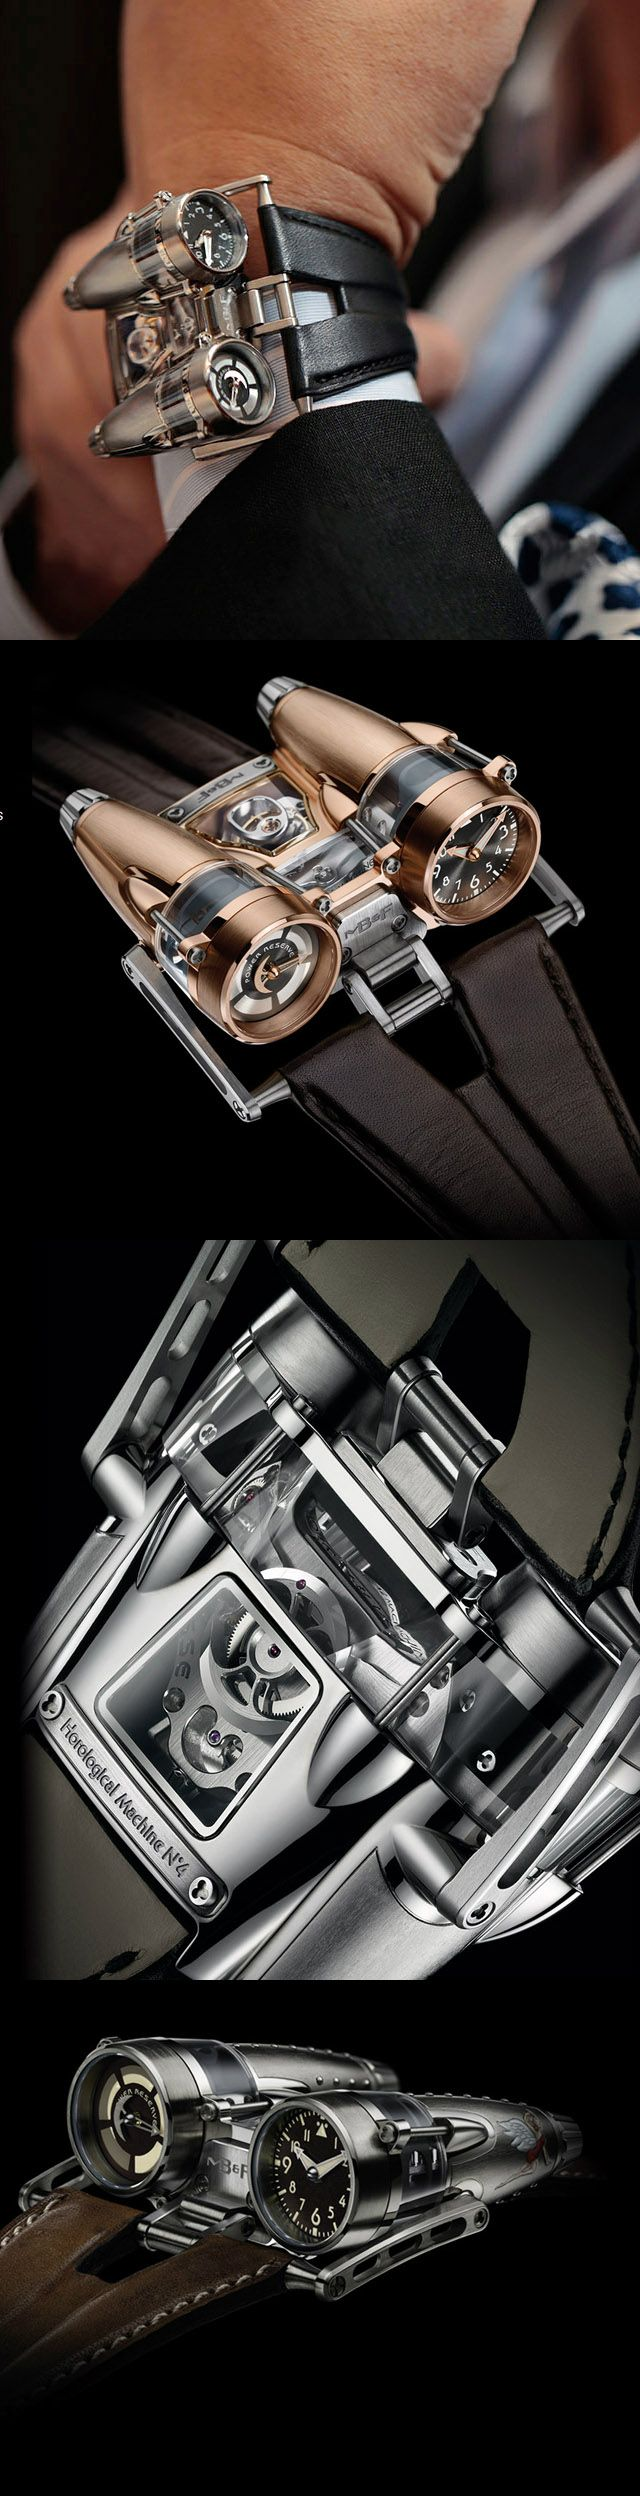 MB HM4 Thunderbolt Watch